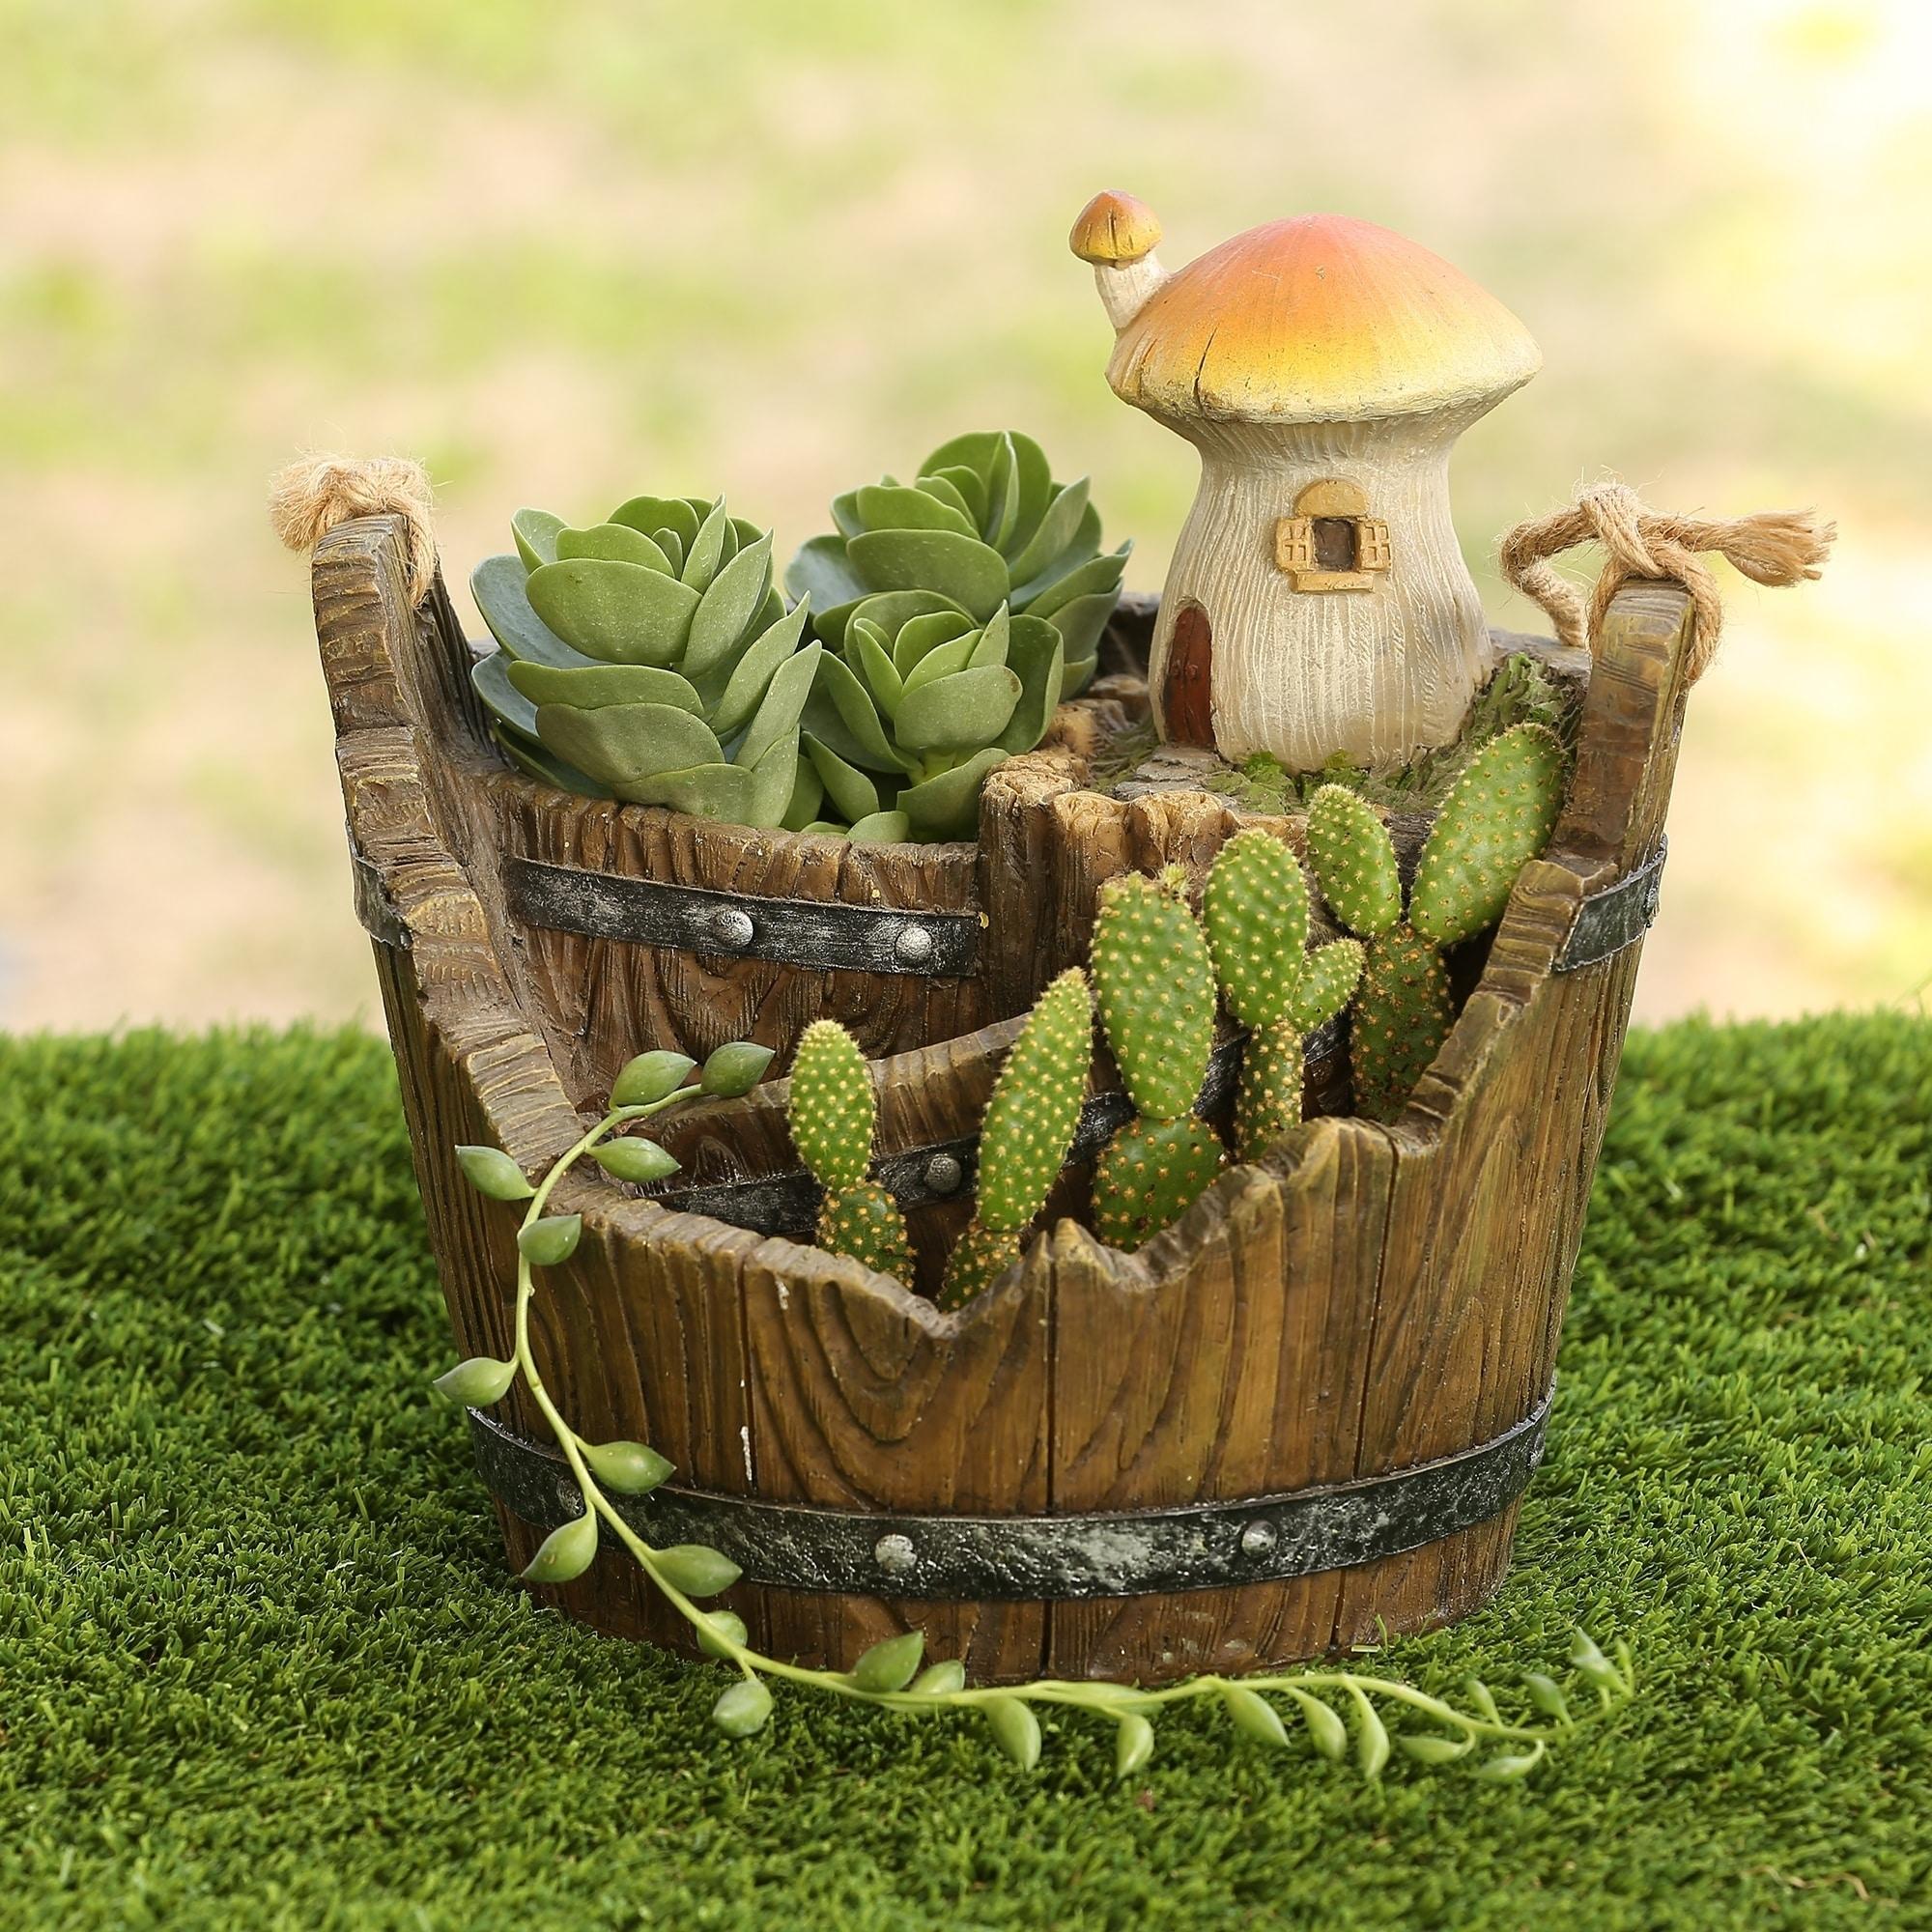 Mushroom House Bucket Planter Miniature Fairy Garden (Sma...